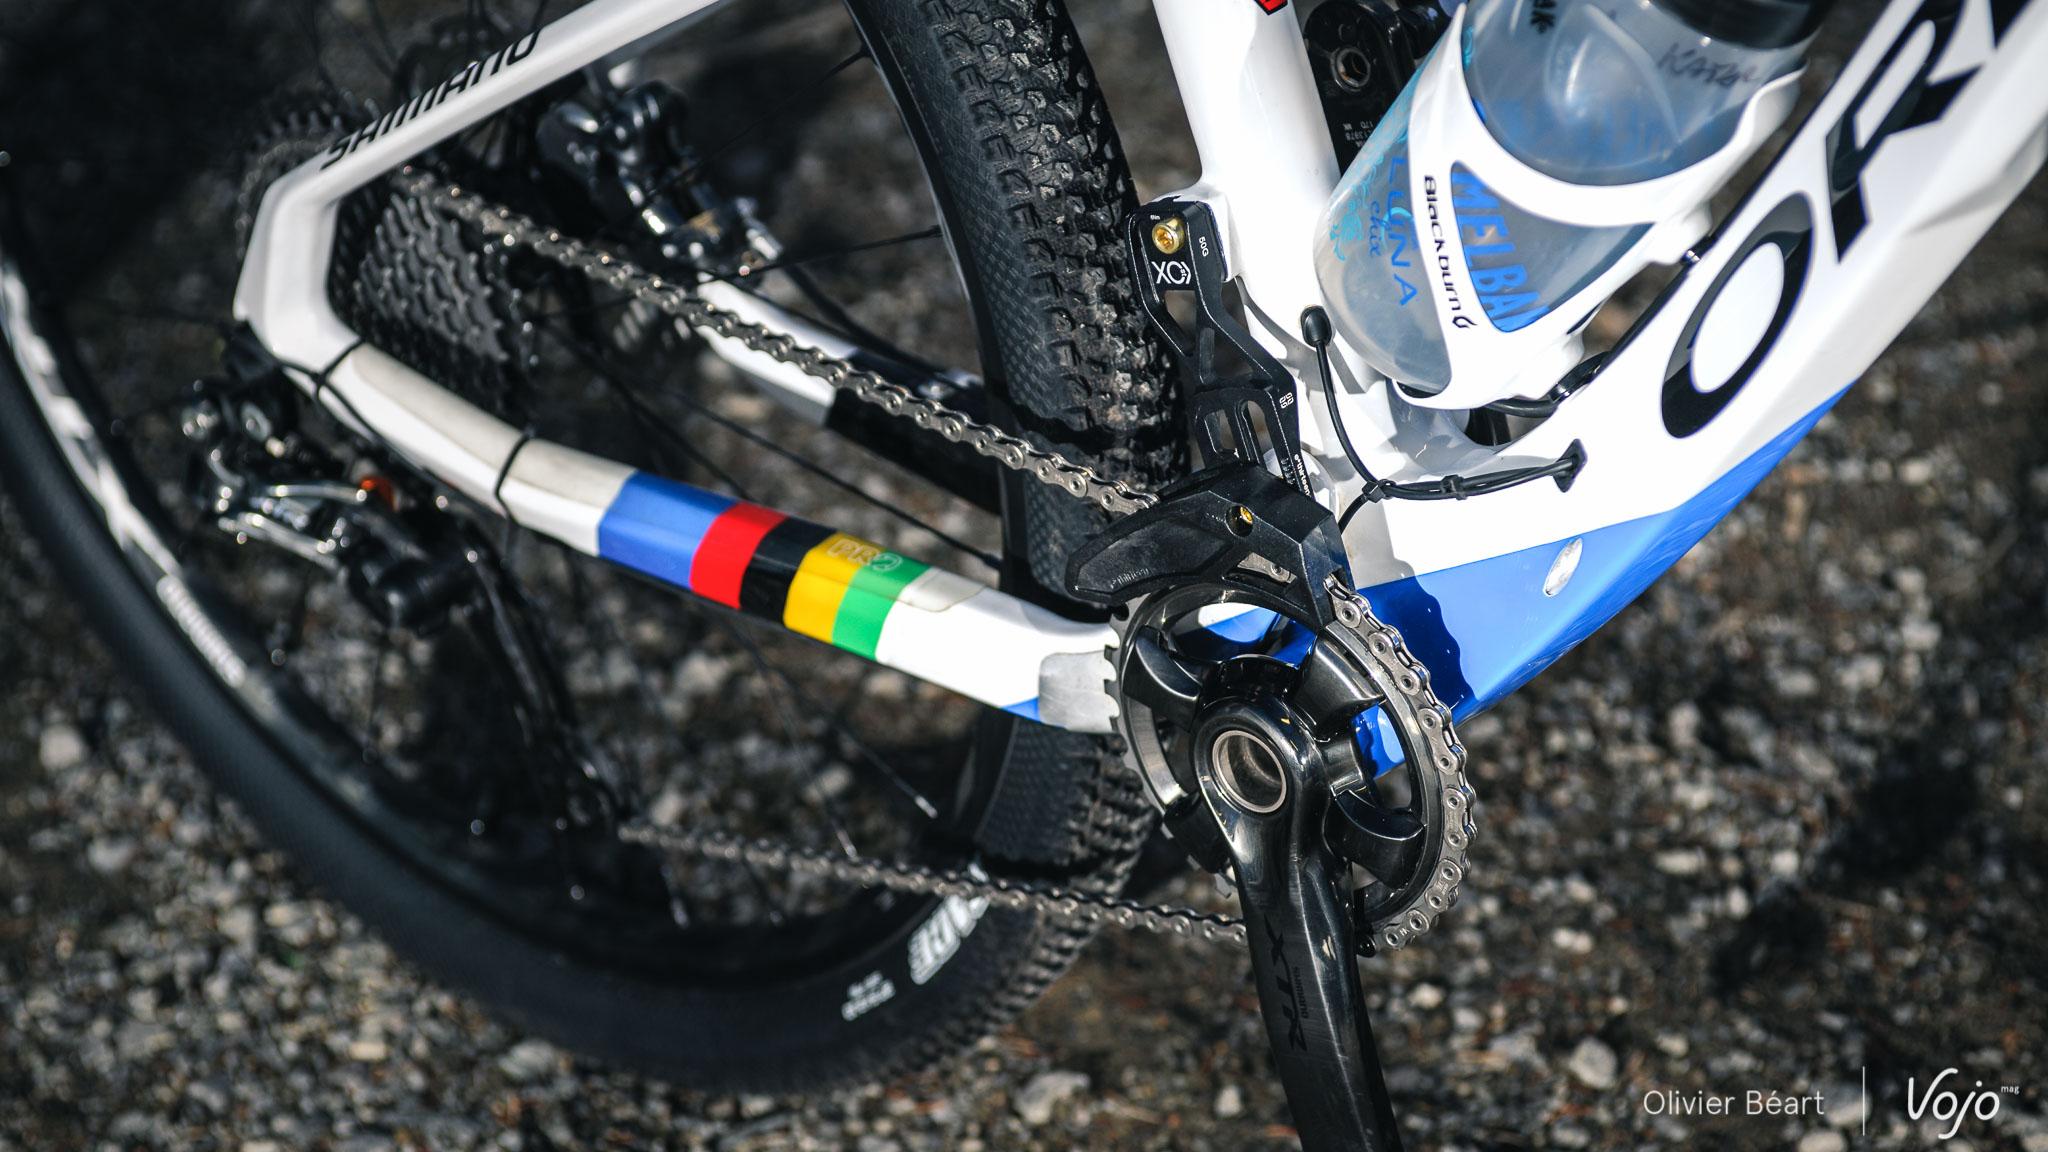 World_Cup_MTB_Pro_Bike_Check_Catharine_Pendrel°Orbea_Oiz_Copyright_OBeart_VojoMag-1-2